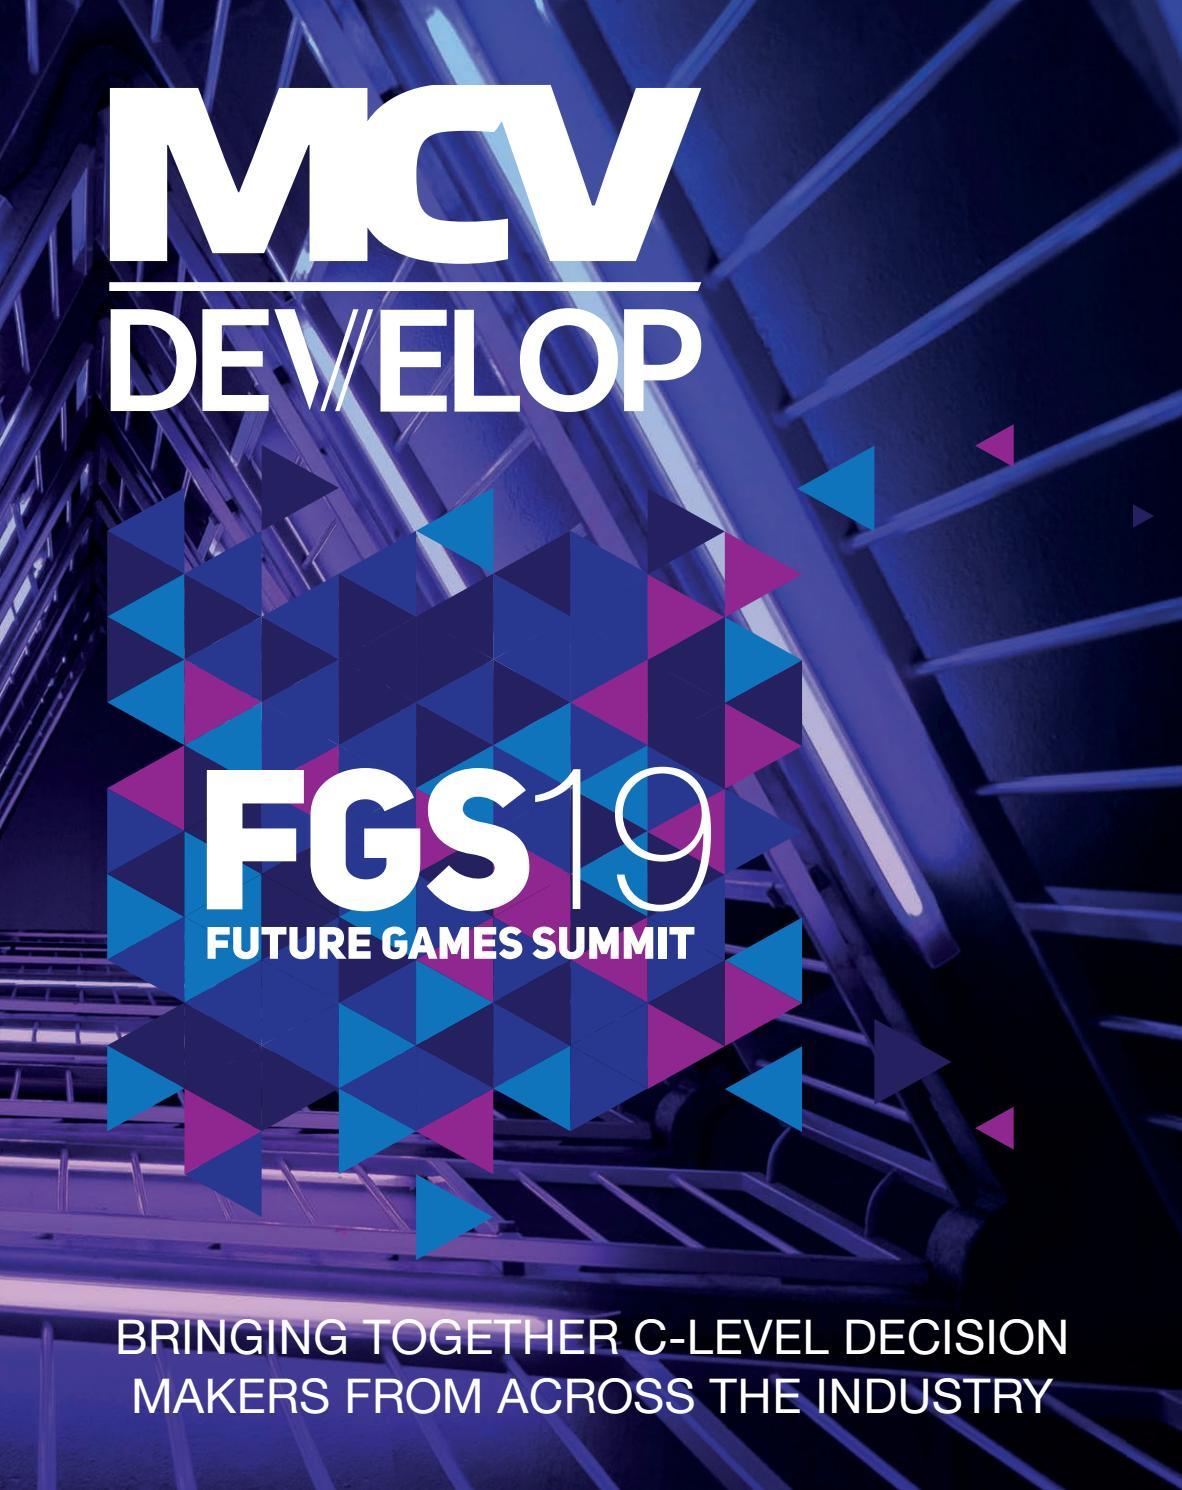 Mcv Develop 951 October 2019 By Biz Media Ltd Issuu